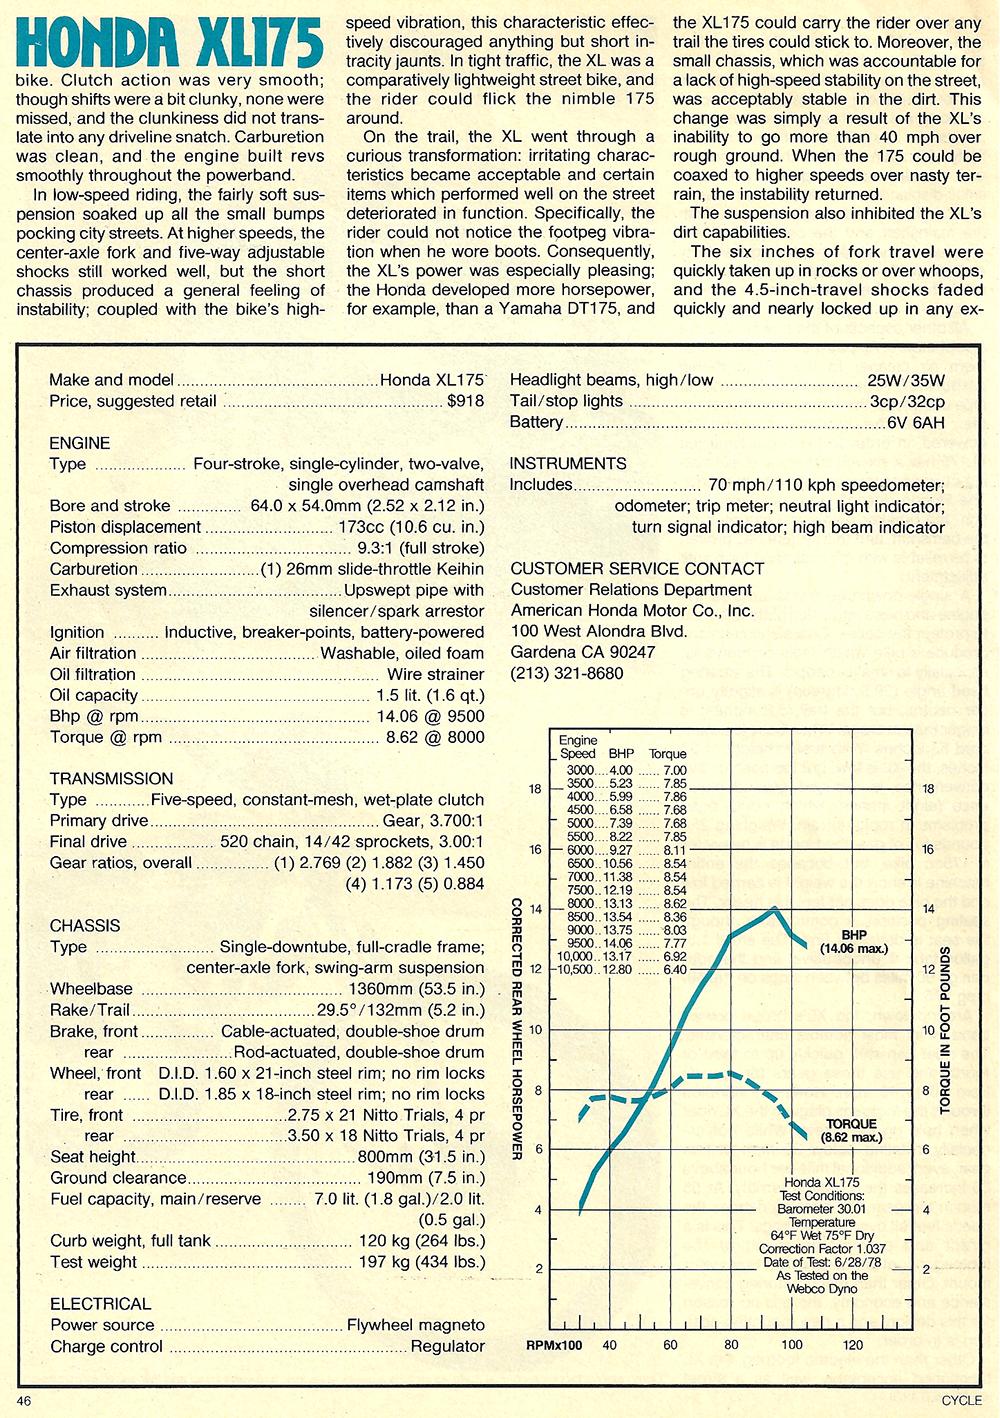 1978 Honda XL175 road test 04.jpg